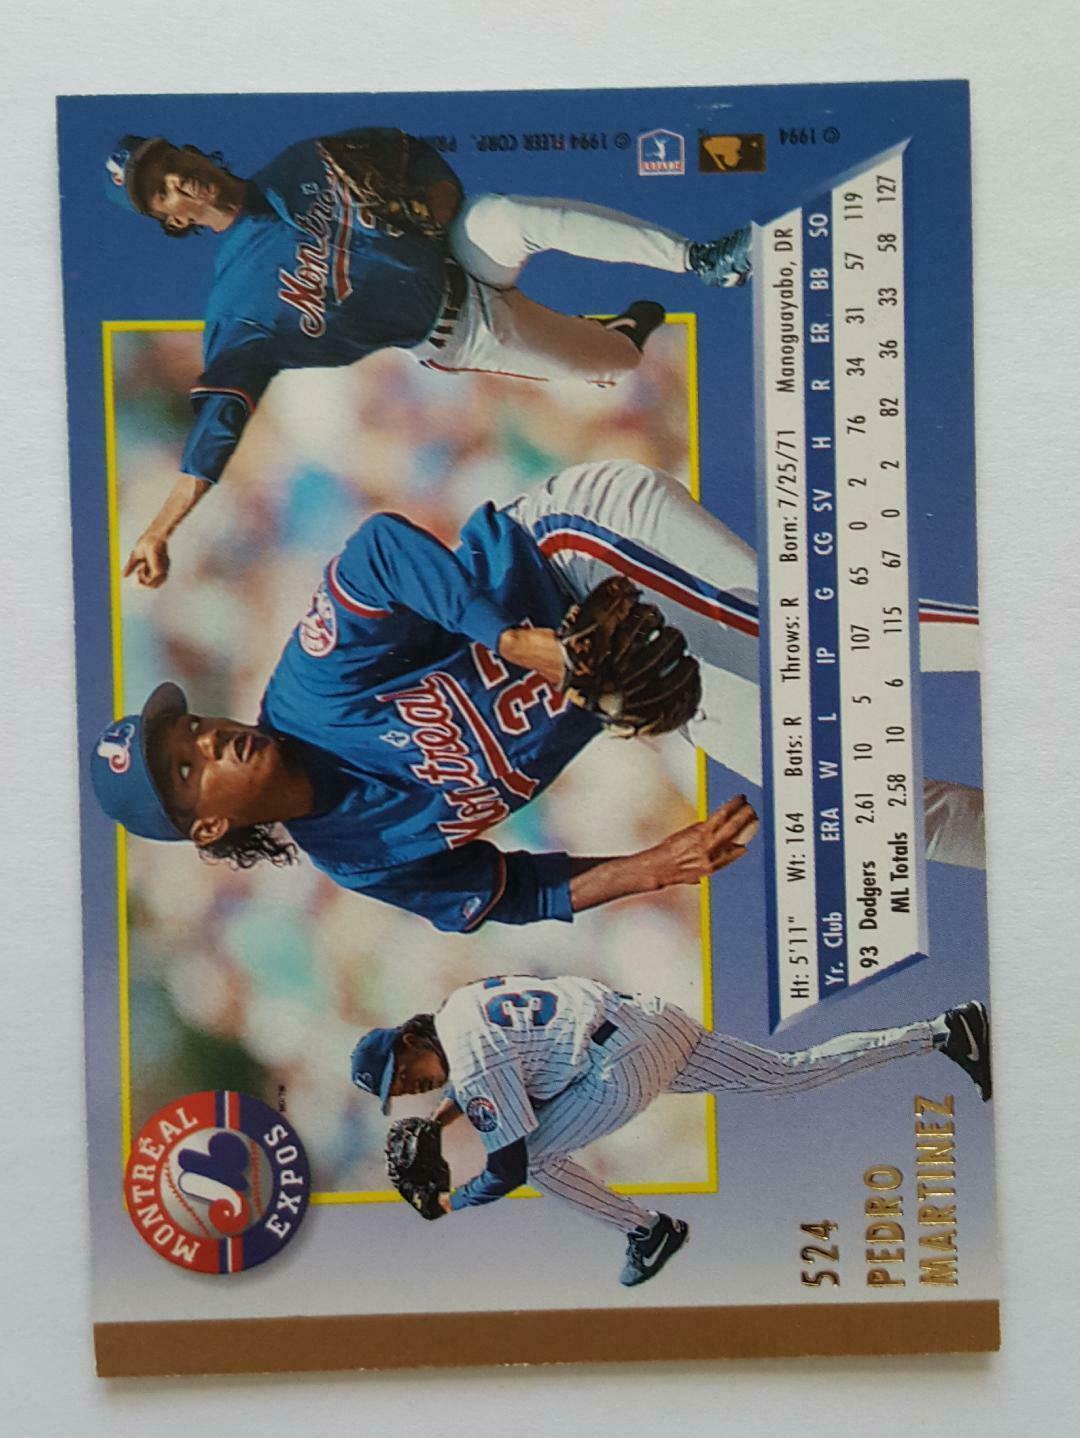 1994 Fleer Ultra + Rookie Card Lot NM Cond w/ Pat Ripp, Clint Davis, Nice Cards image 3